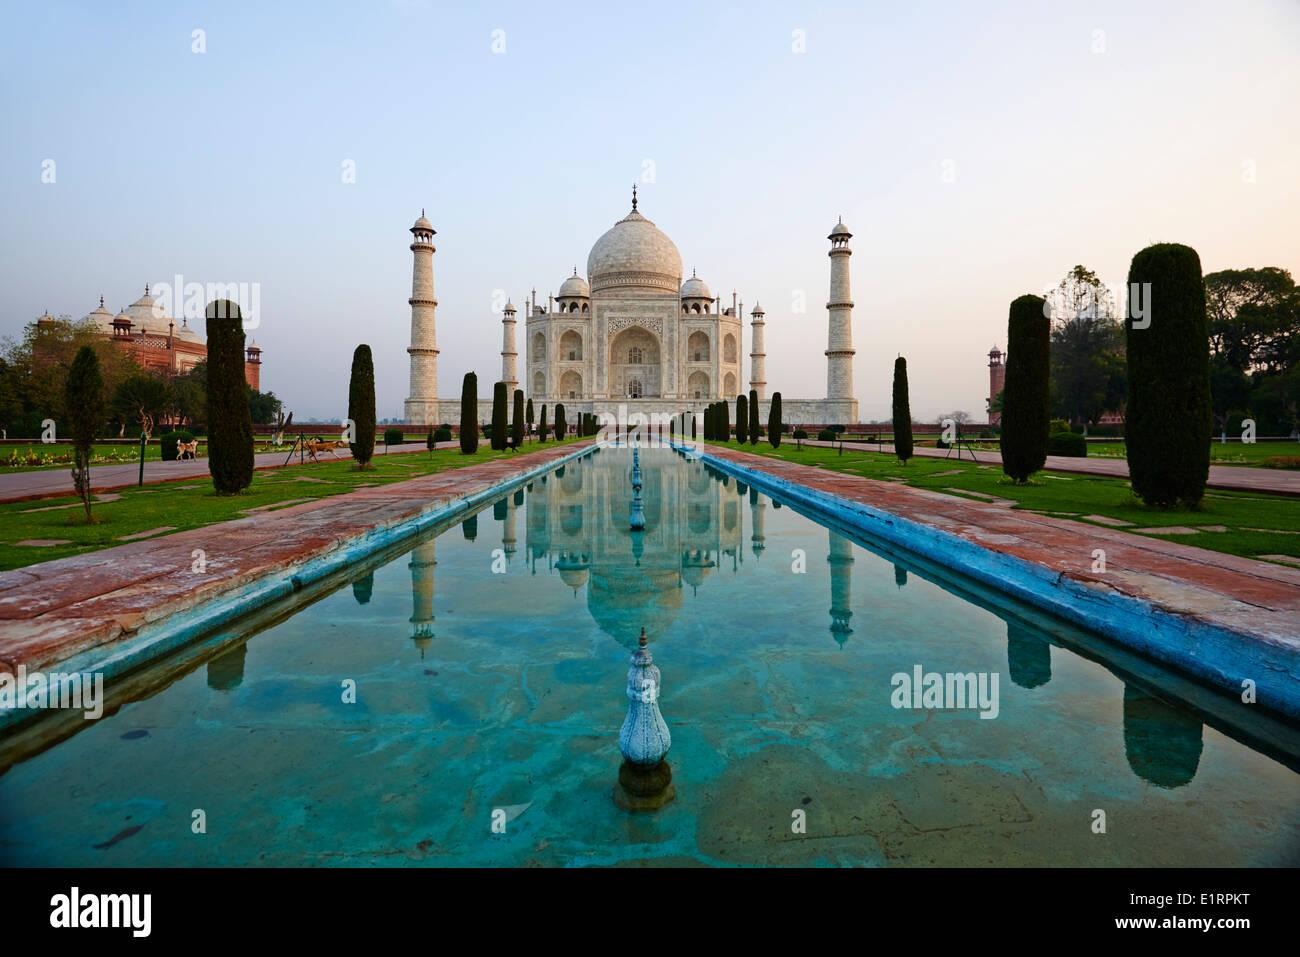 Indien, Bundesstaat Uttar Pradesh, Agra, Taj Mahal, UNESCO-Welterbe Stockbild